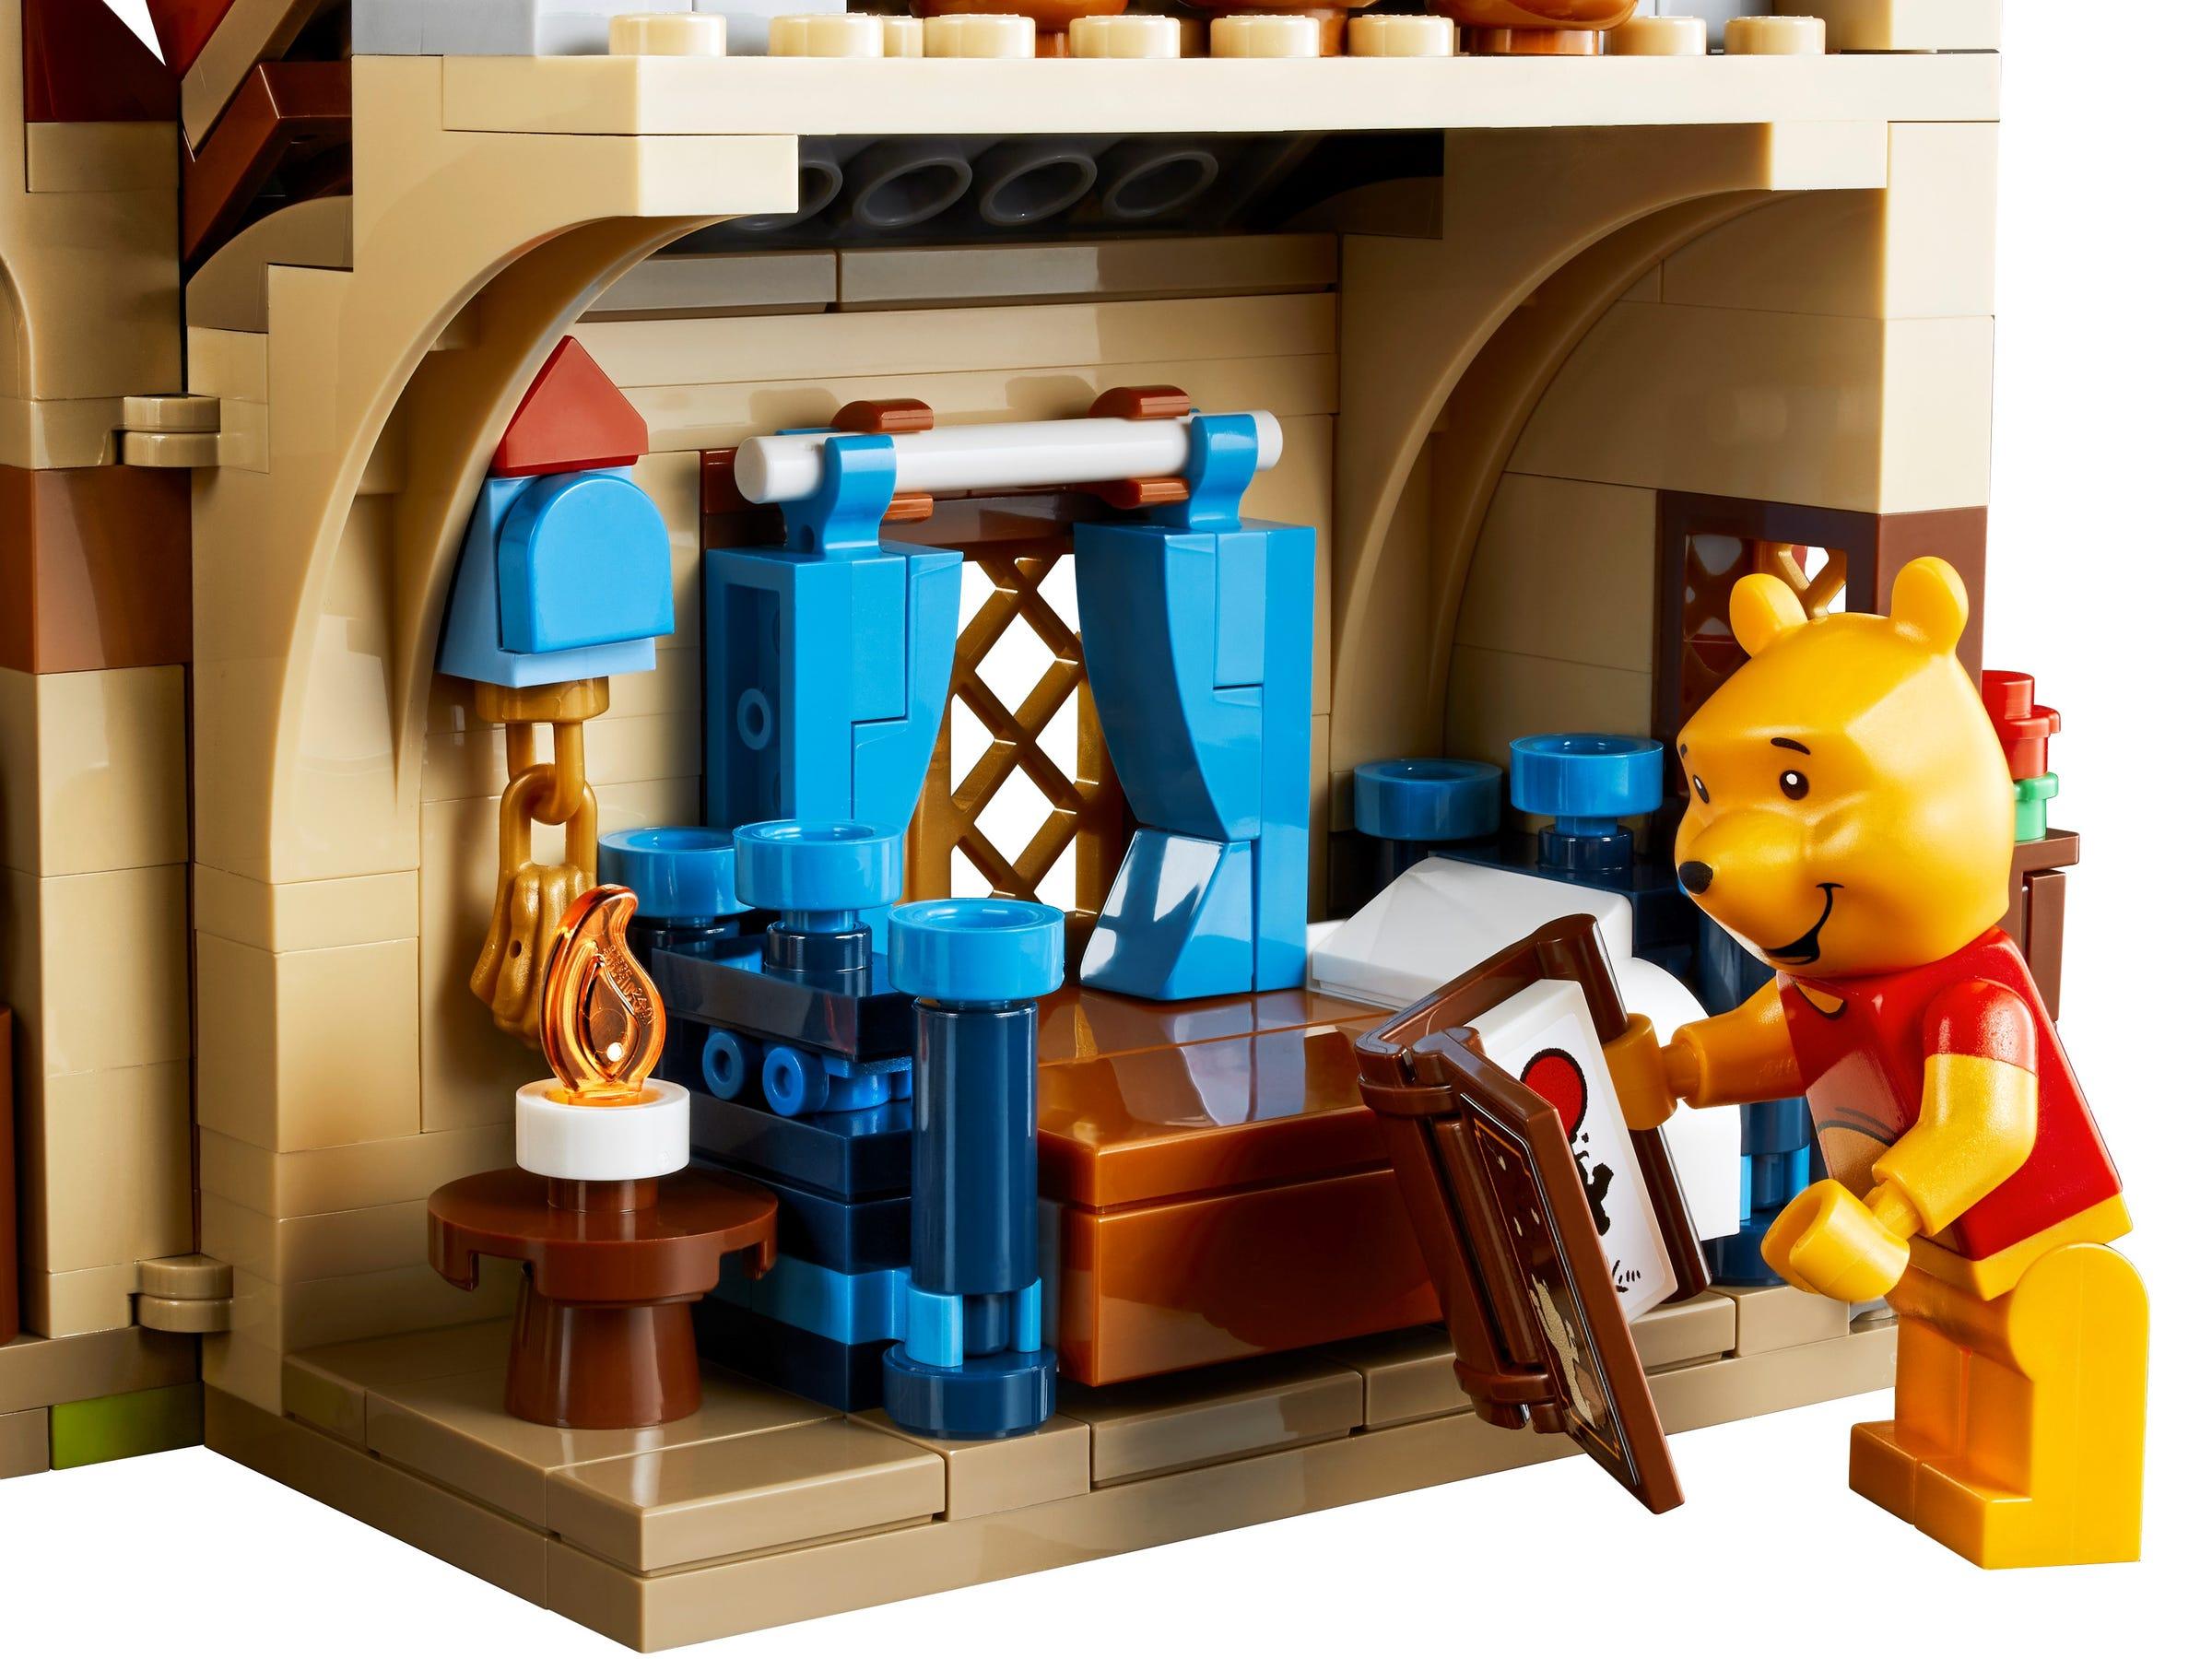 LEGO Winnie The Pooh - Interior Shot